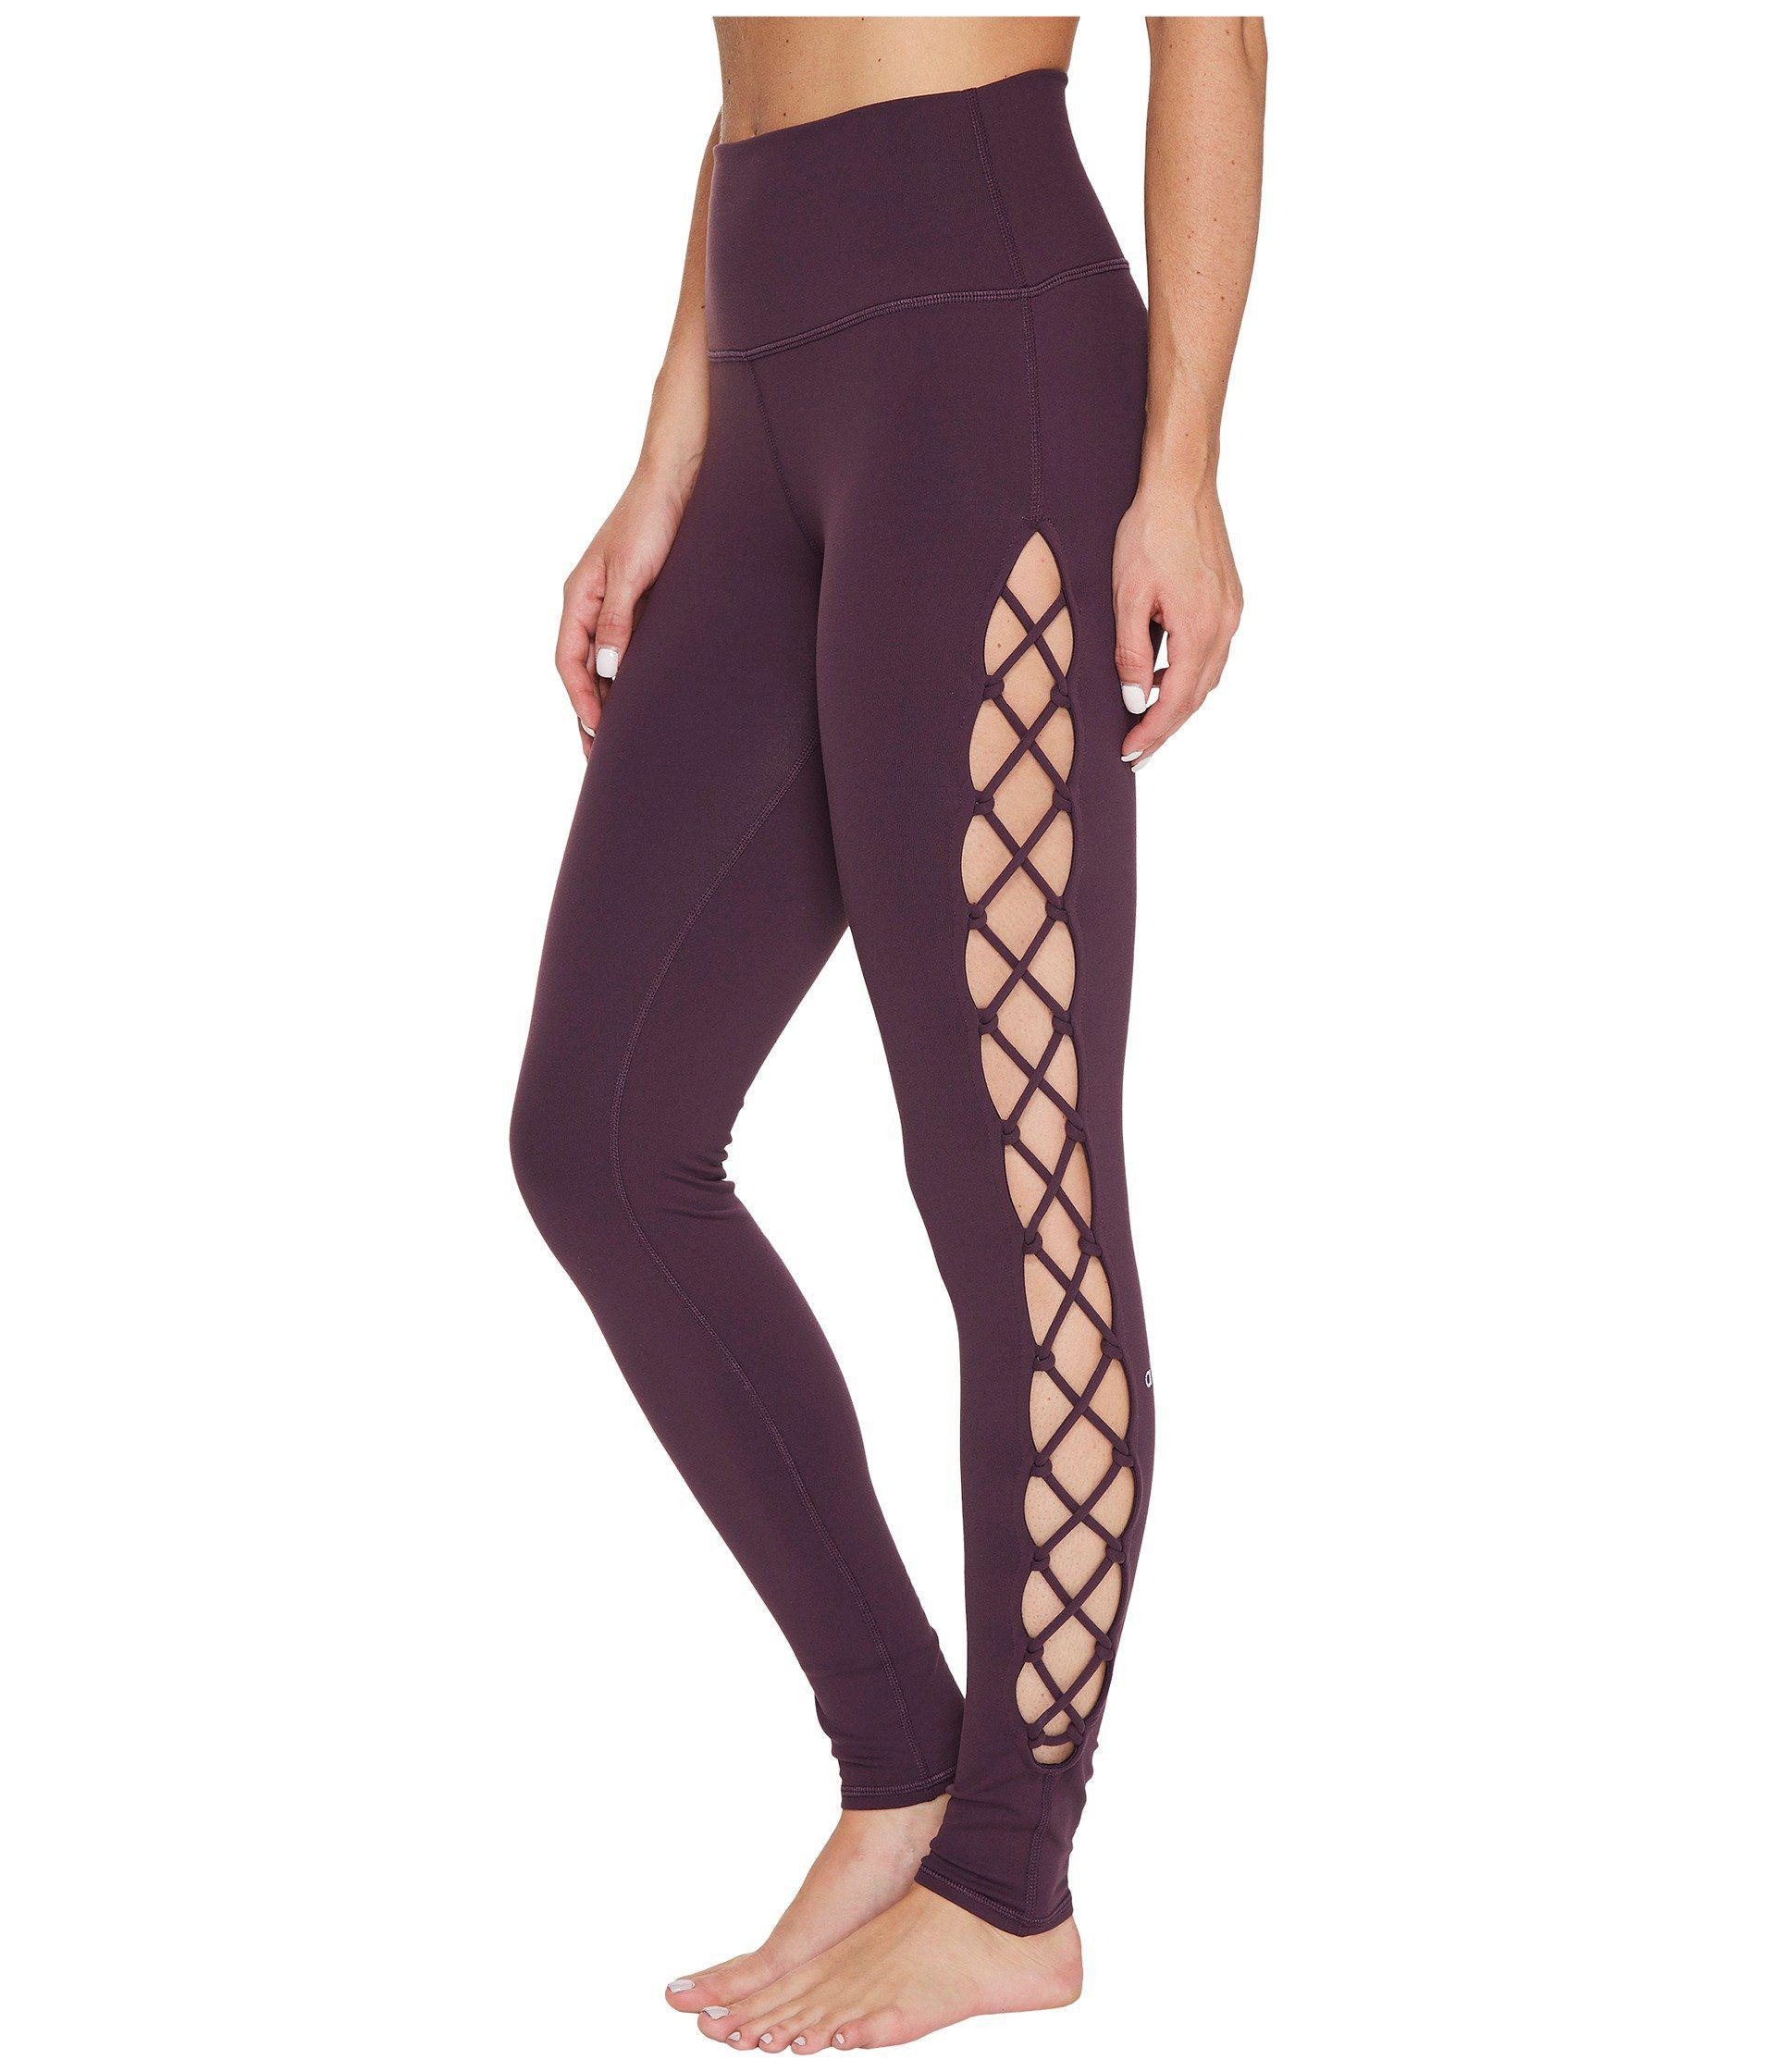 492f287d54 Lyst - Alo Yoga Interlace Leggings in Purple